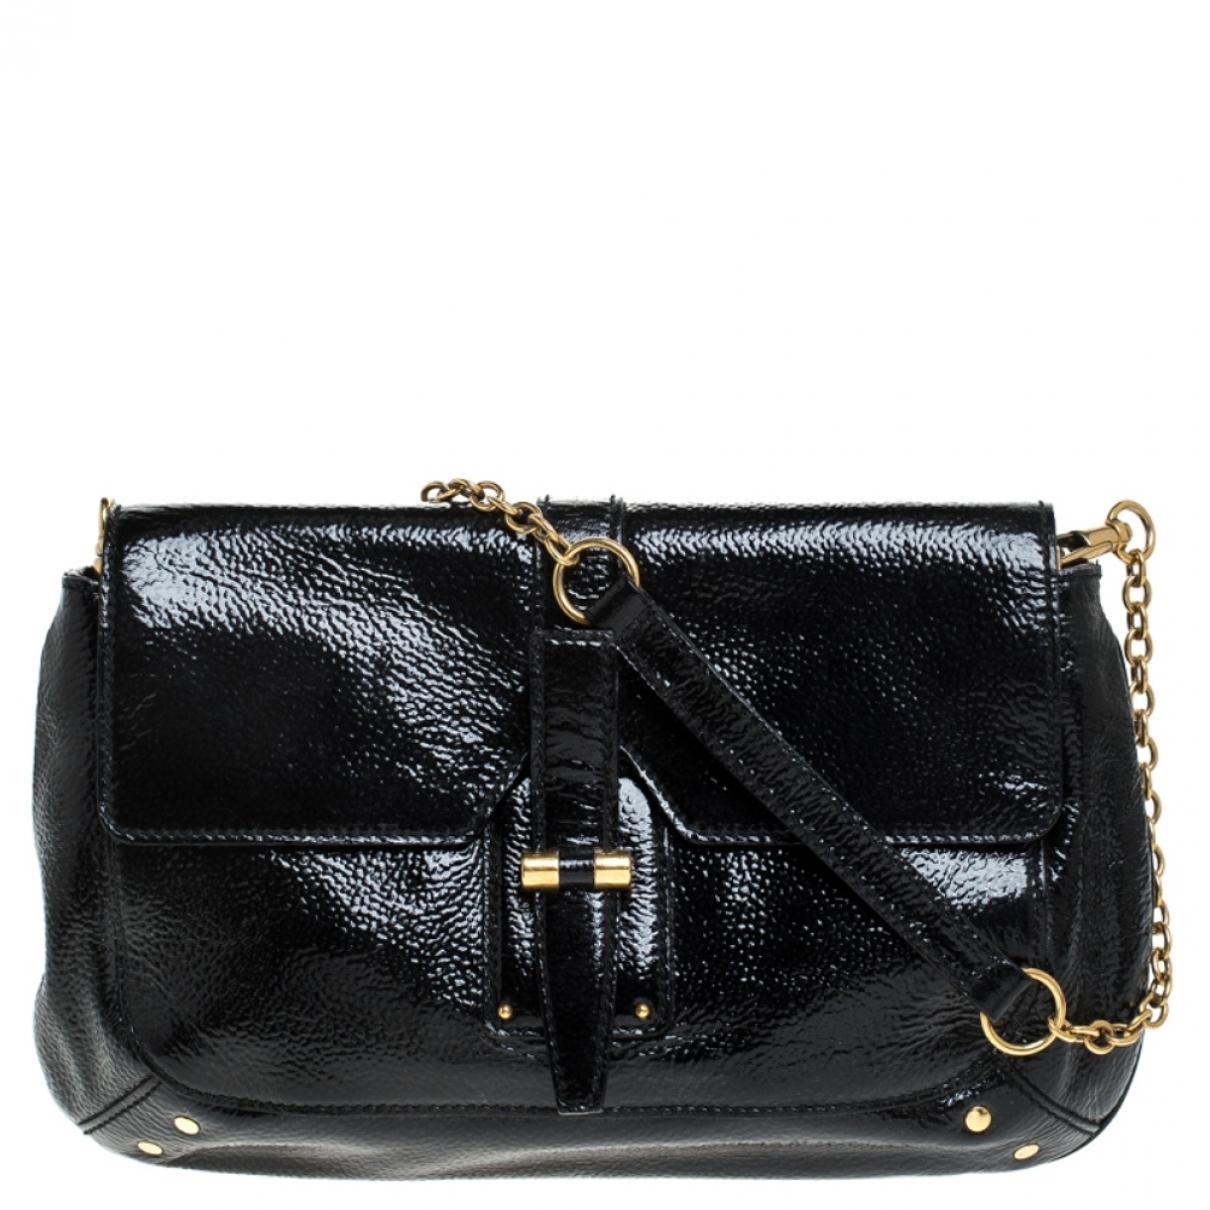 Saint Laurent \N Black Patent leather handbag for Women \N